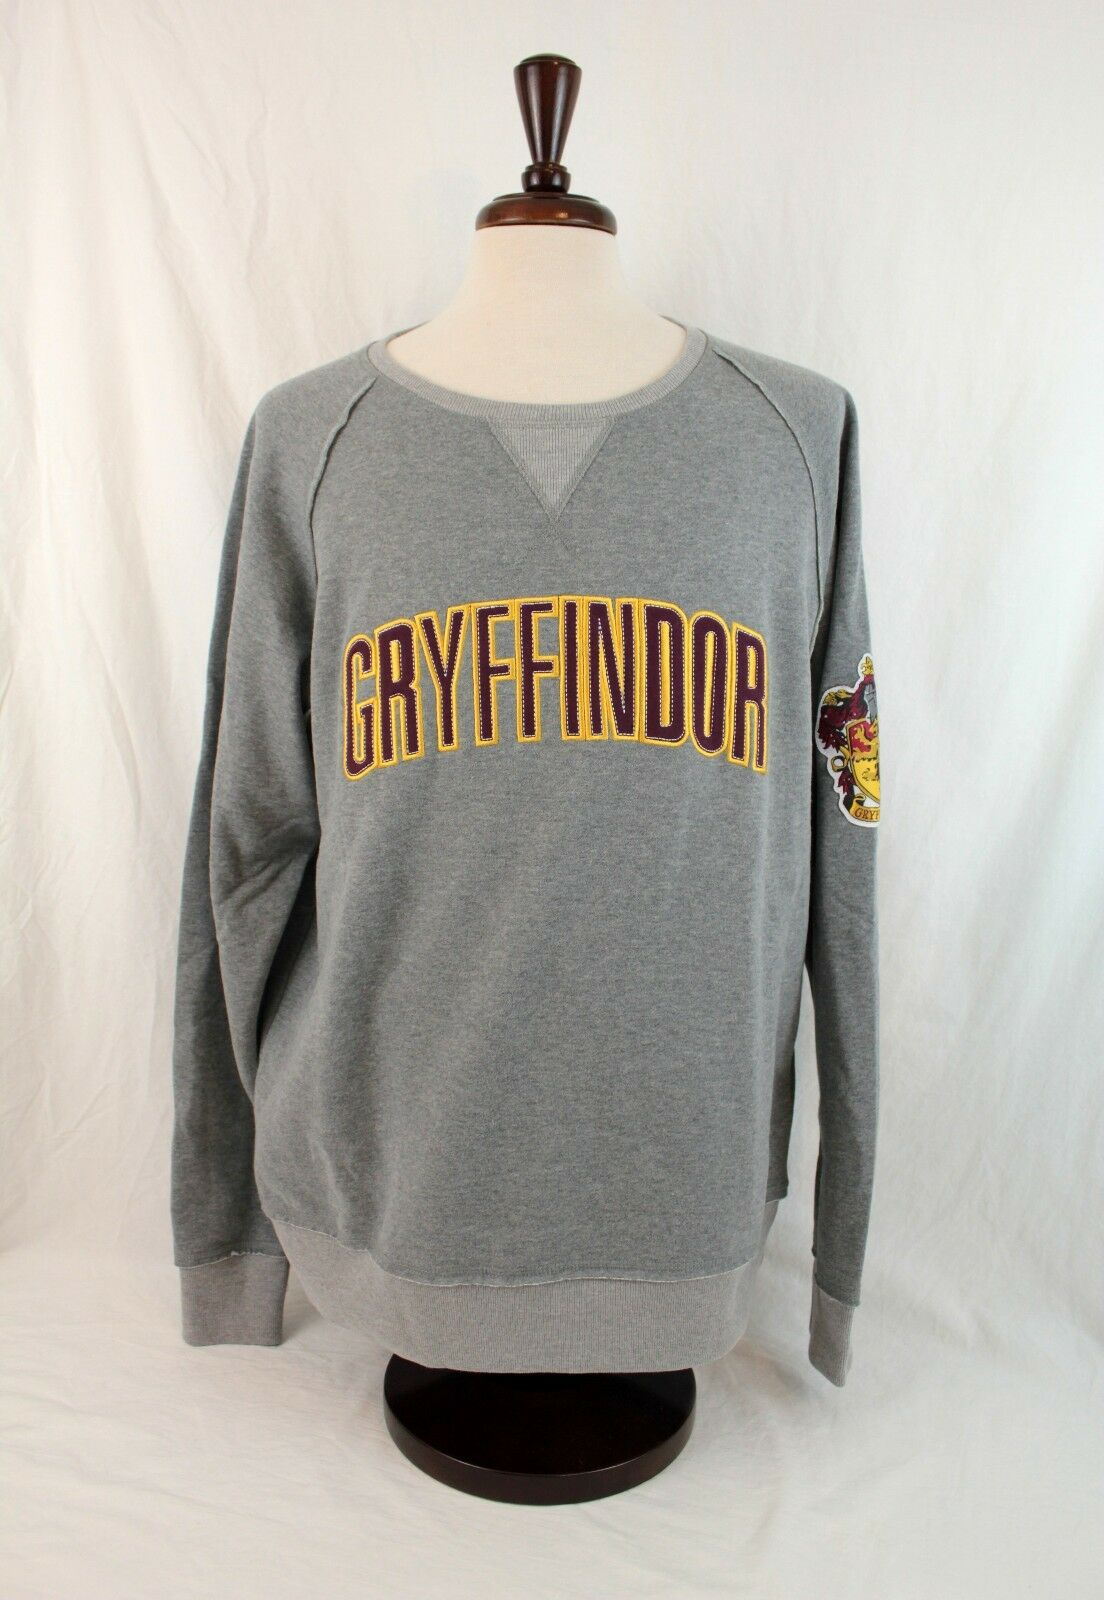 Wizarding World Of Harry Potter Gryffindor Varsity Sweater XS S M L XL XXL